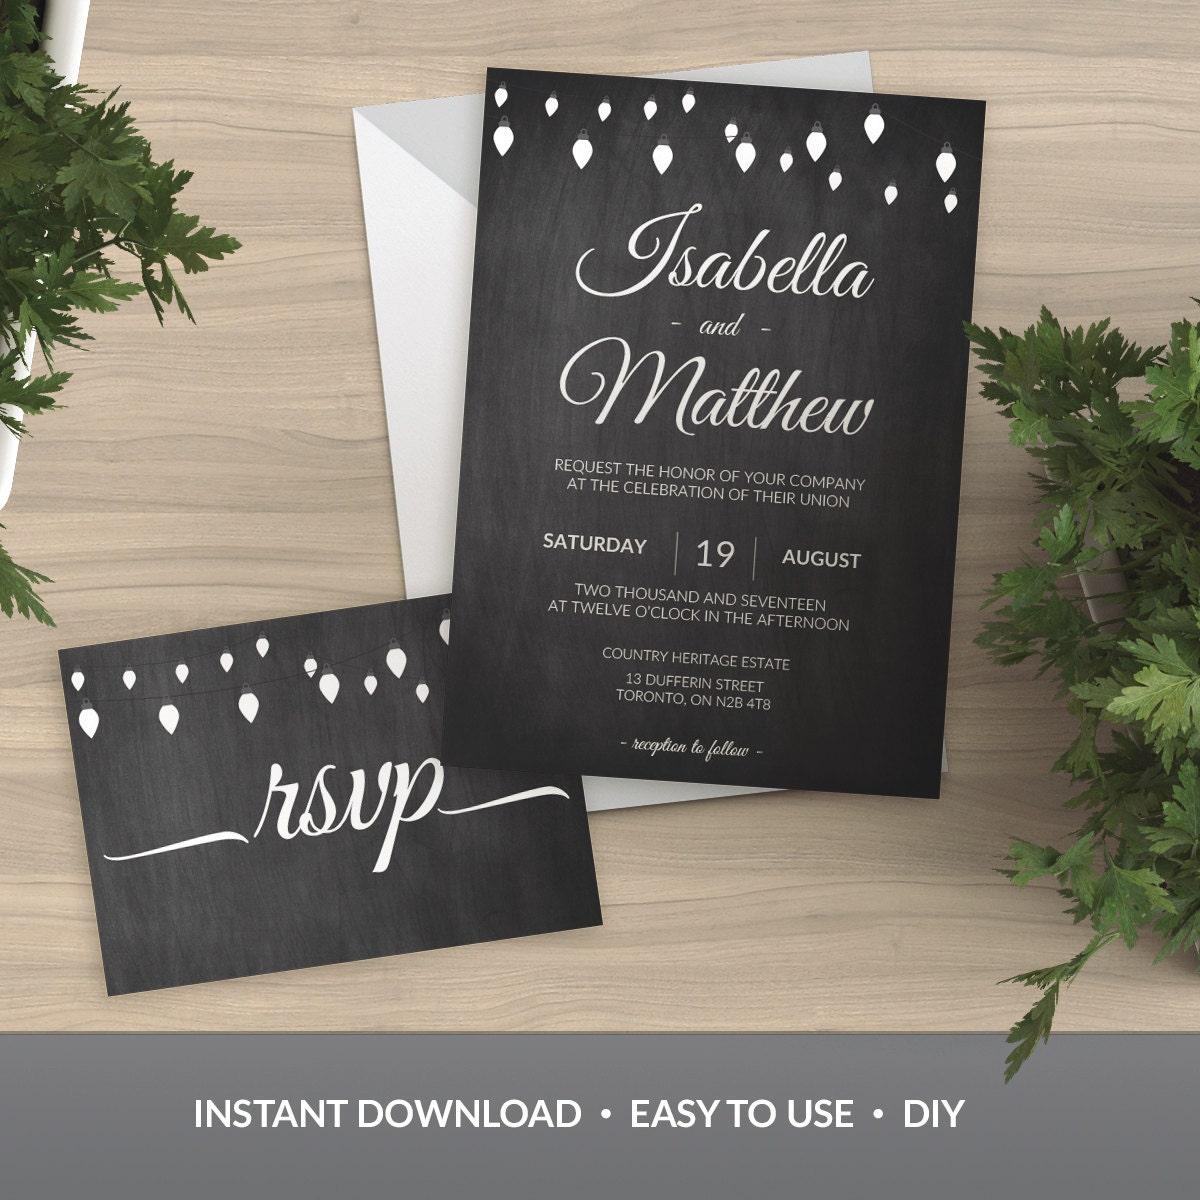 Chalkboard Wedding Invitation Template: Wedding Invitation Template Printable Chalkboard & Lights